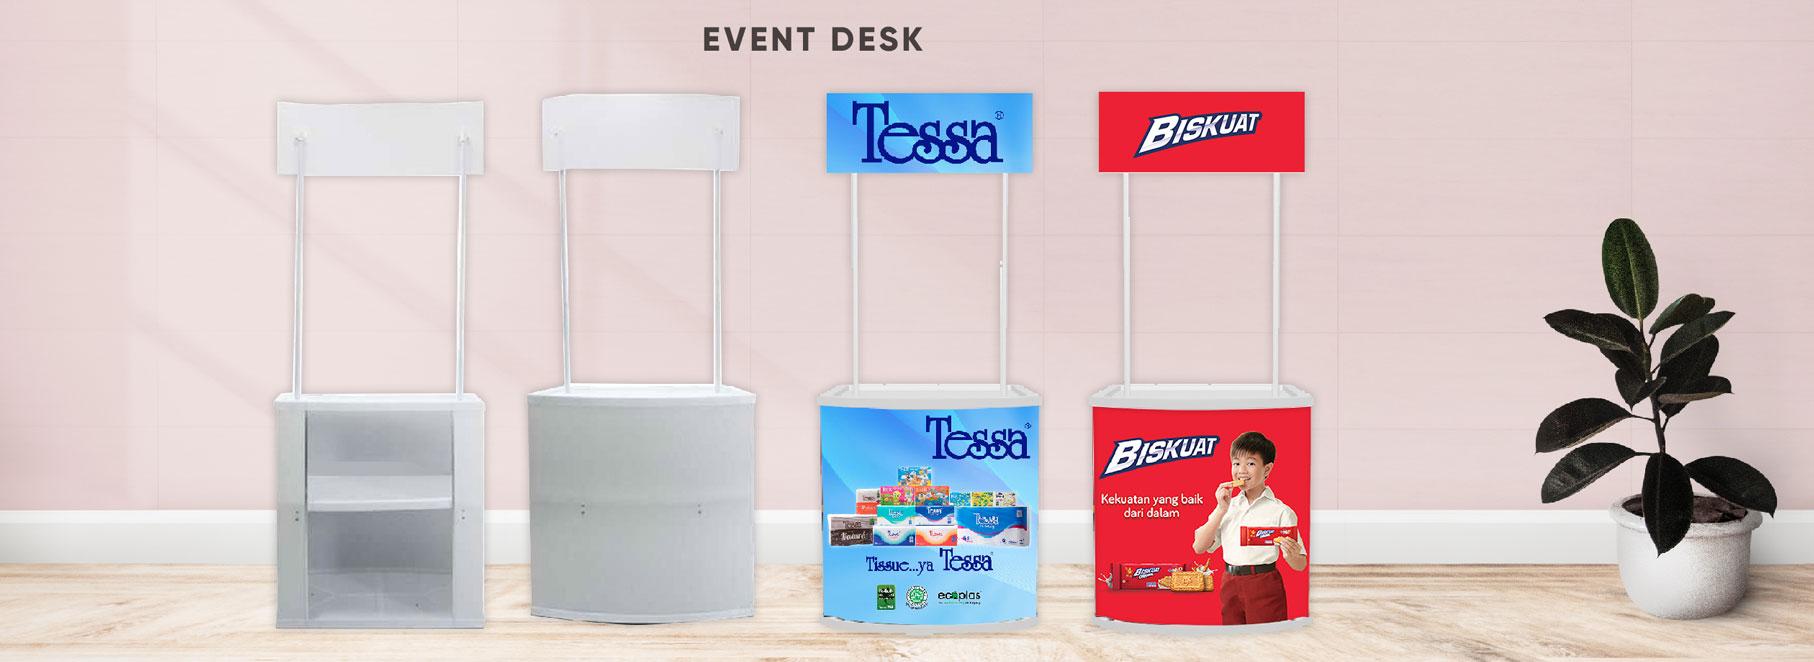 Event Desk